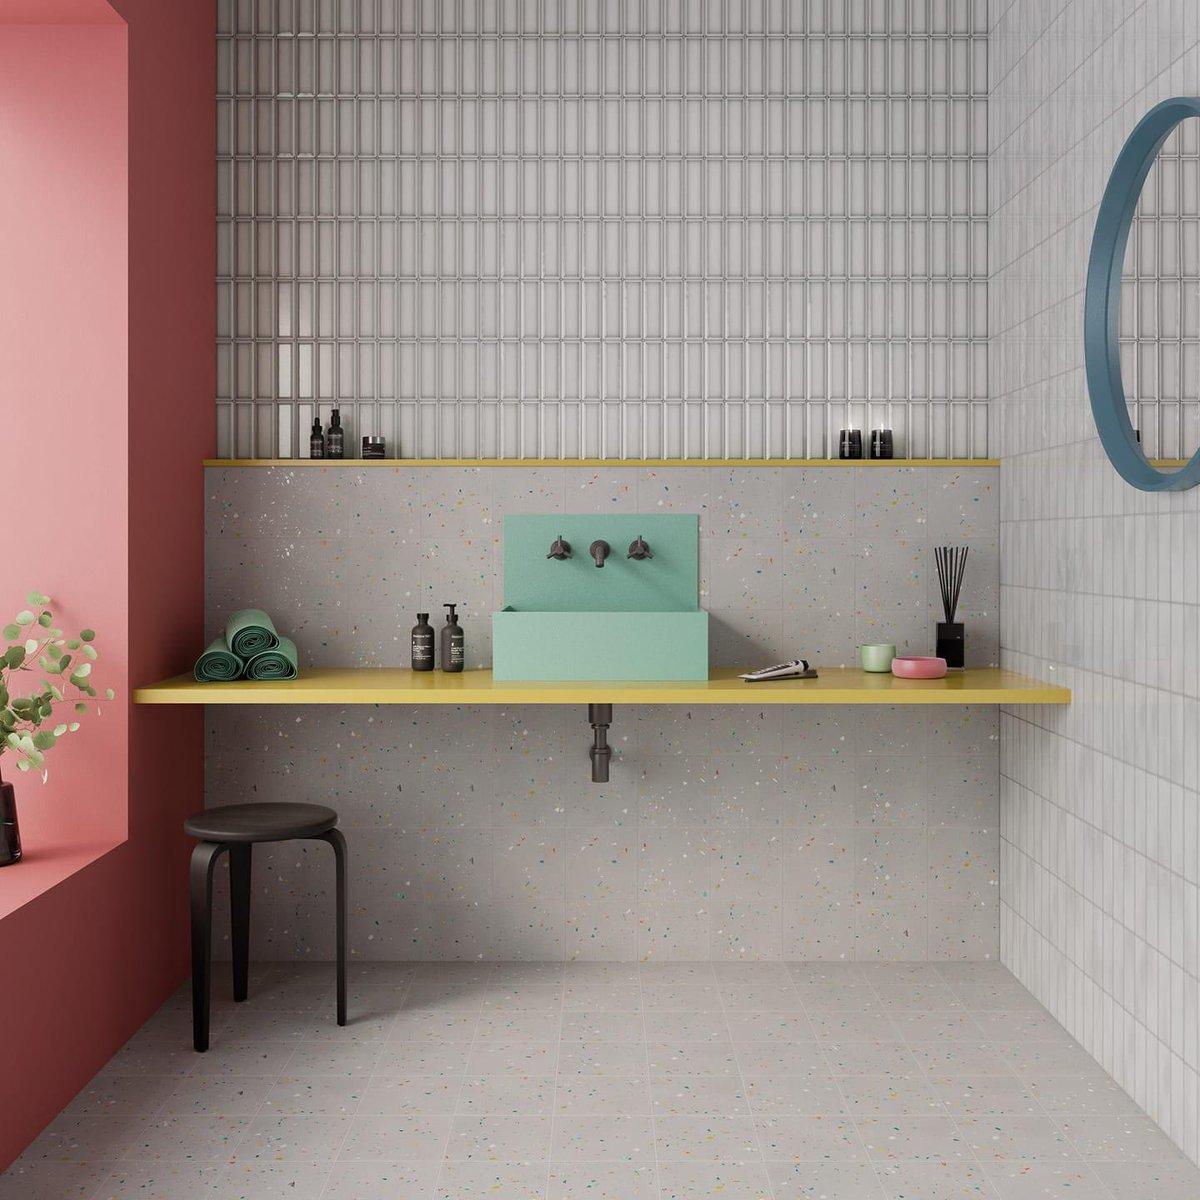 Glaze Effect  #alchemist #glaze #glazeeffects #wowdesigneu #lavabo #bathroomdesign #bathroom #badrum #bathroomtile    #Bienvenidosaldiseño #banyarte #interiordecor #interiorinspiration #design #ilovetiles #tileaddiction  Instagram: @banyarte